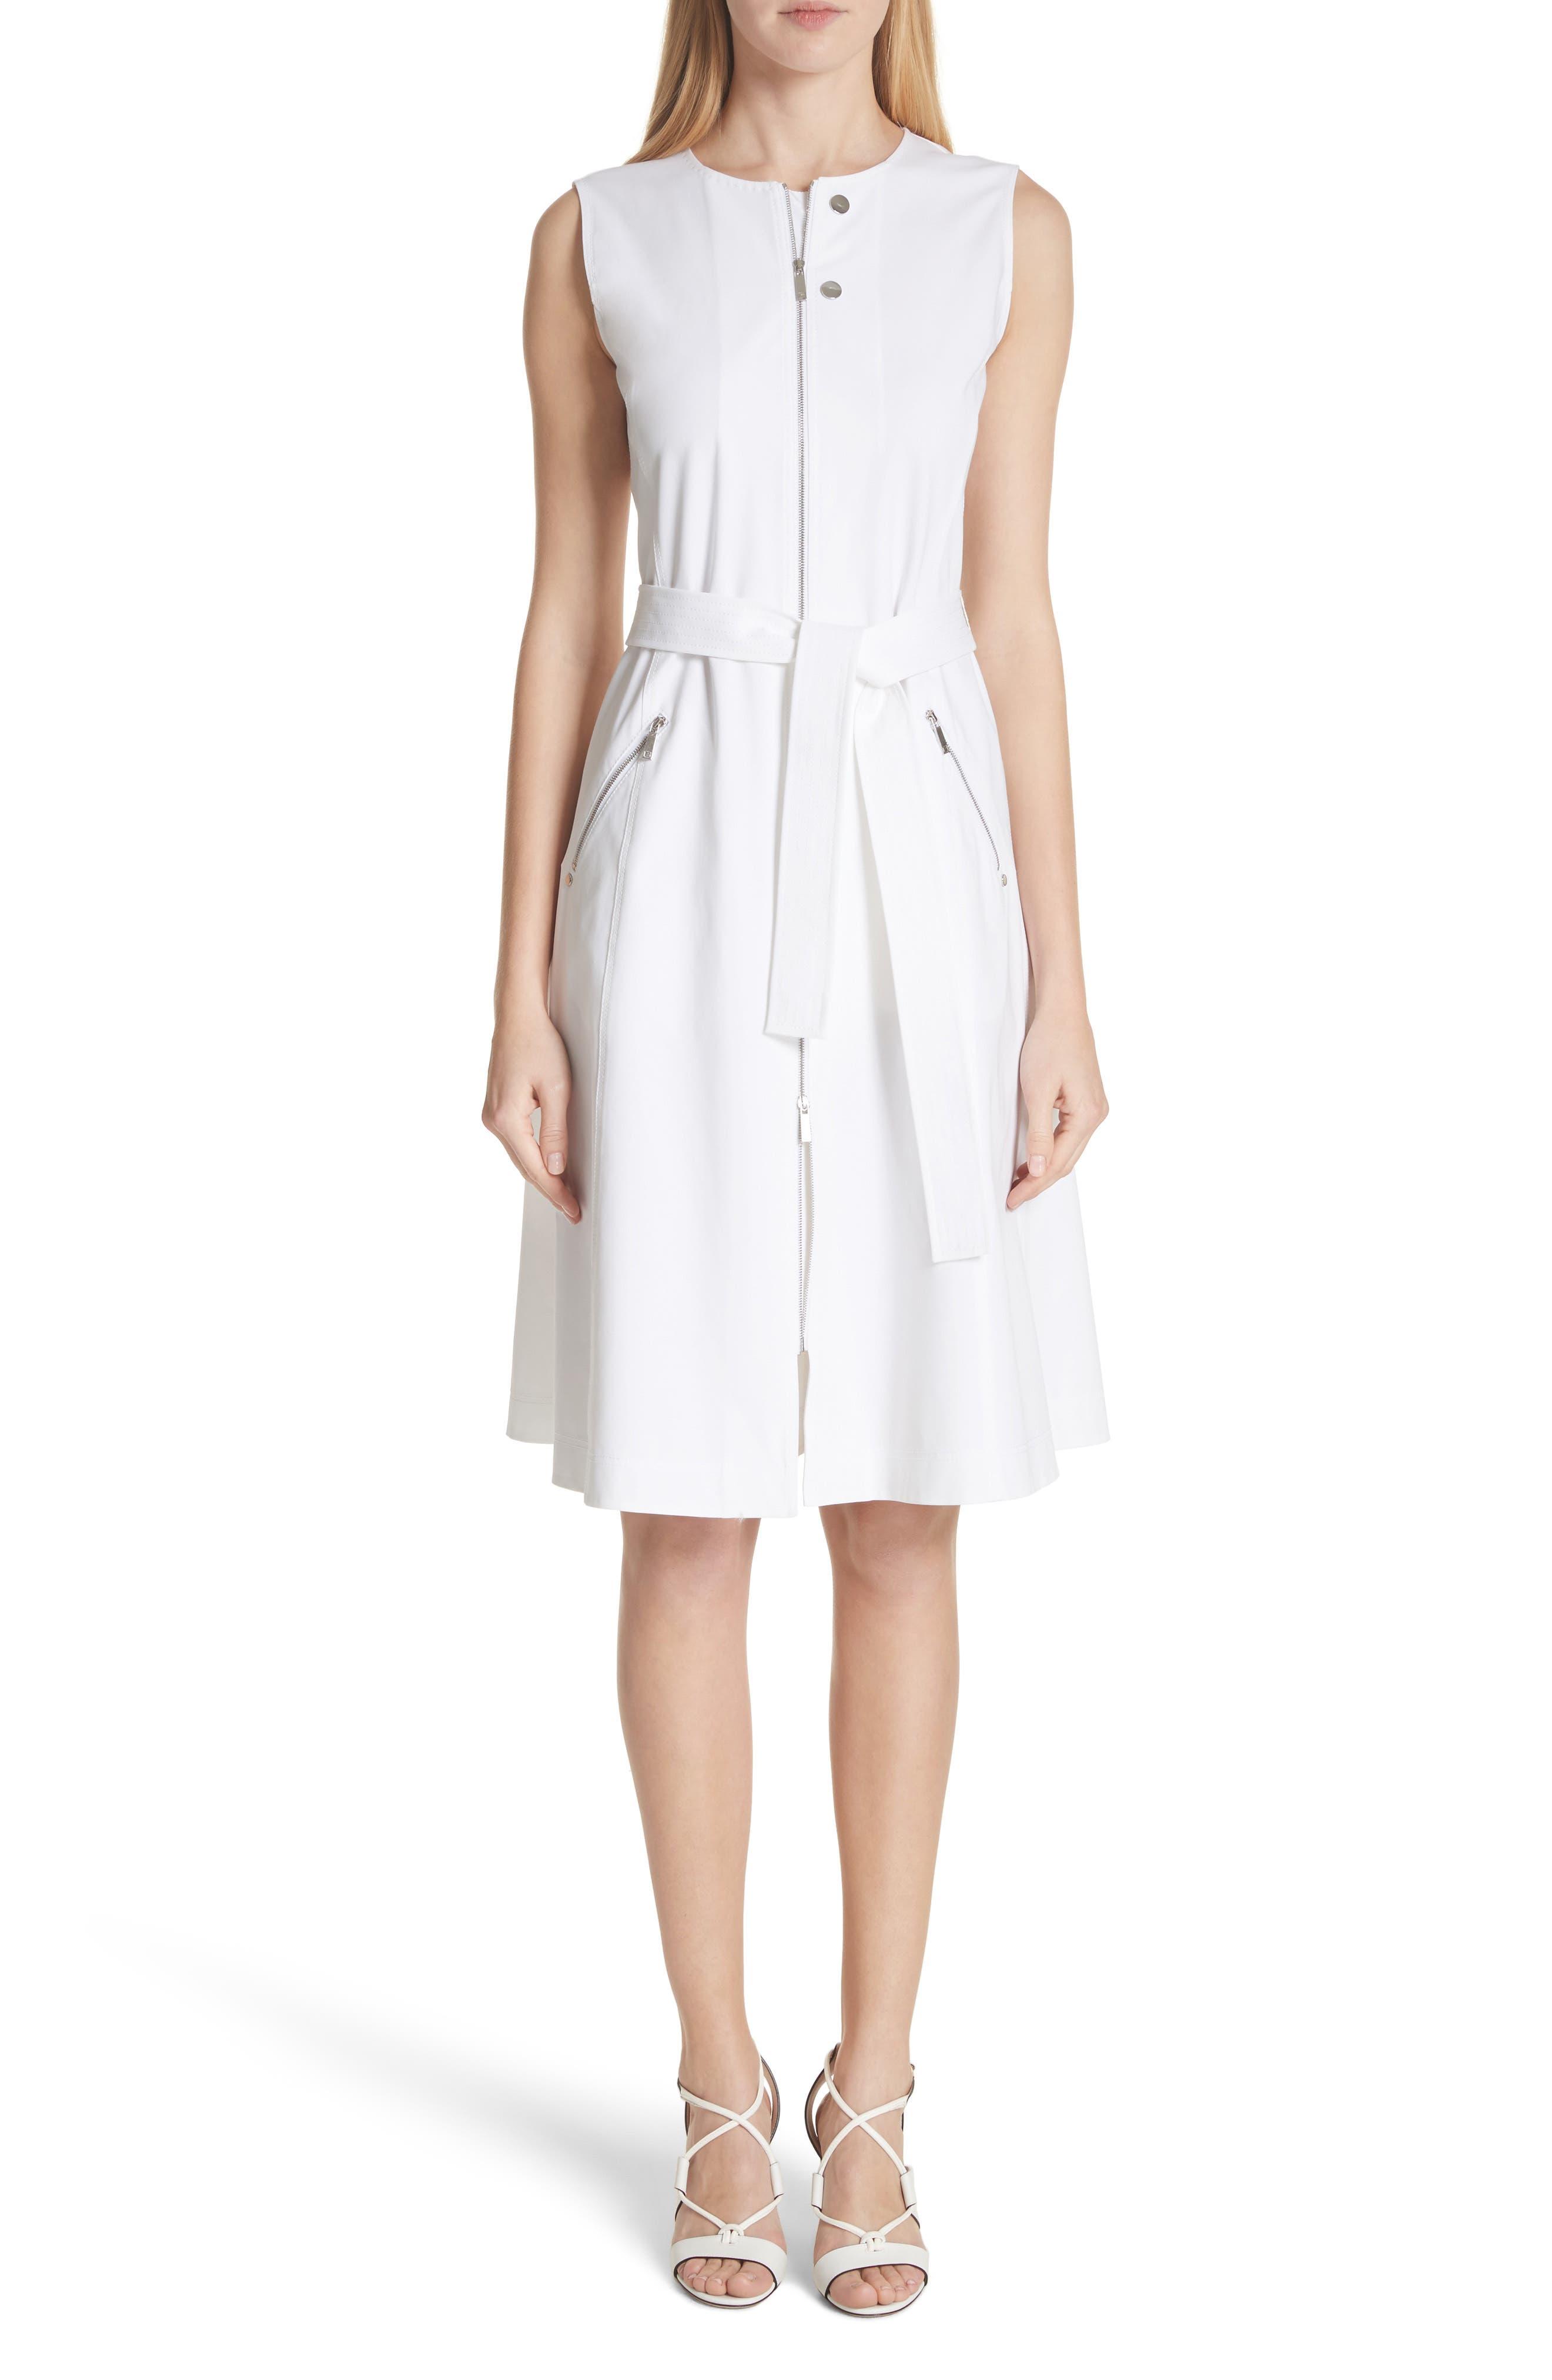 Lafayette 148 New York Karsyn Fit & Flare Dress